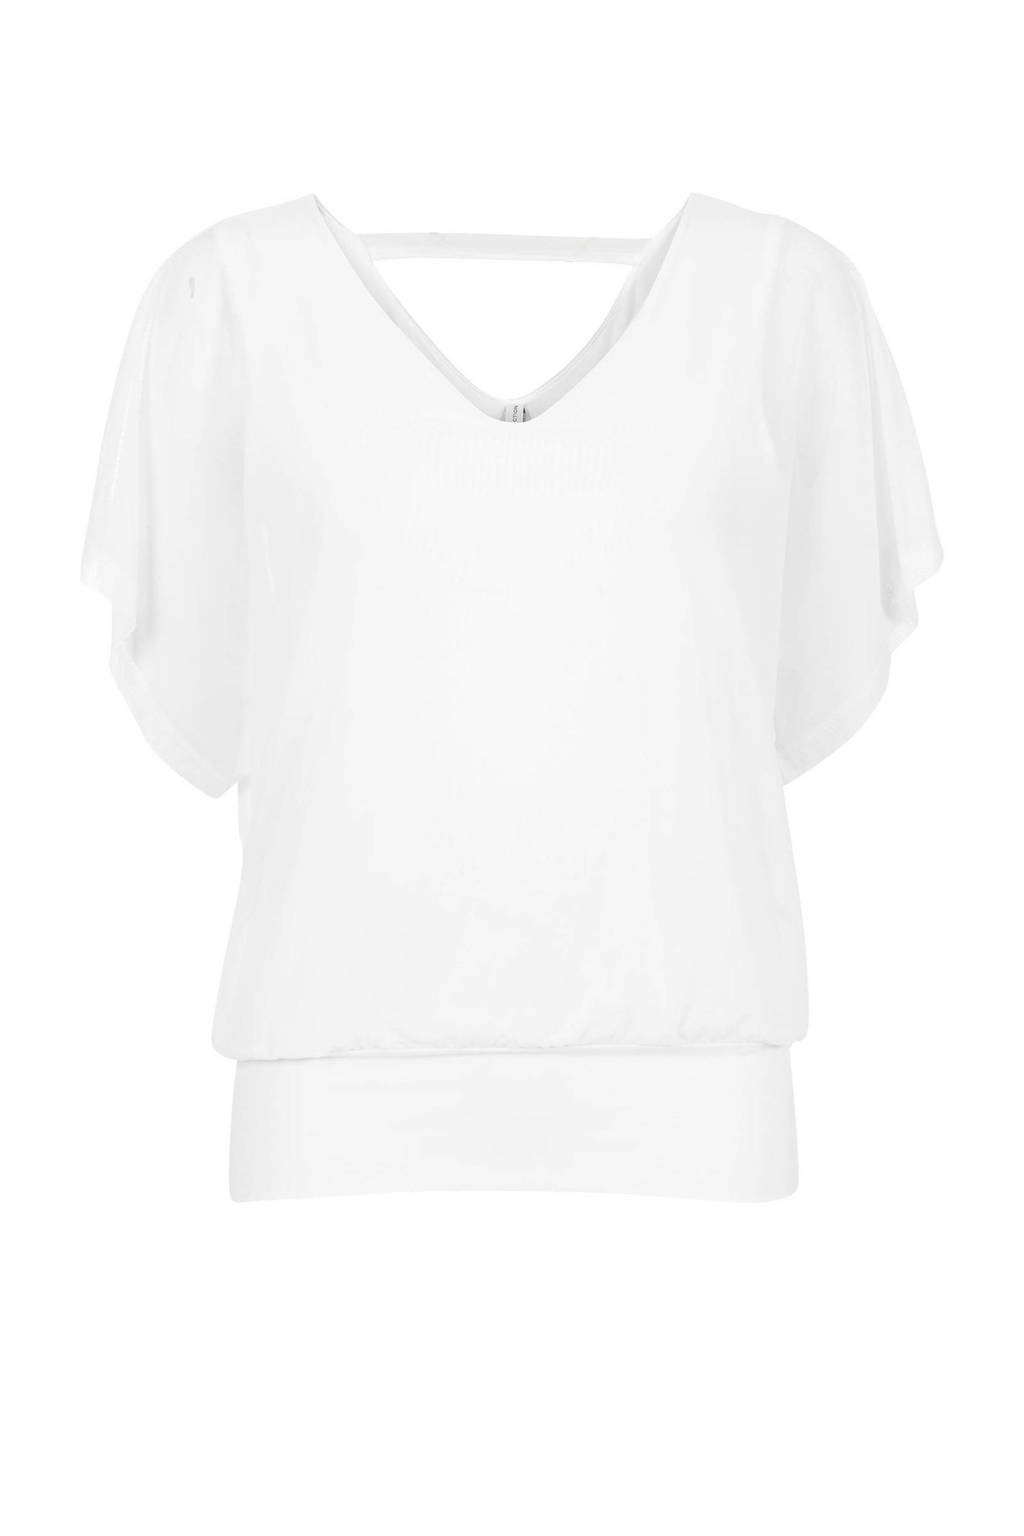 Miss Etam Regulier semi-transparante top met volant wit, Wit